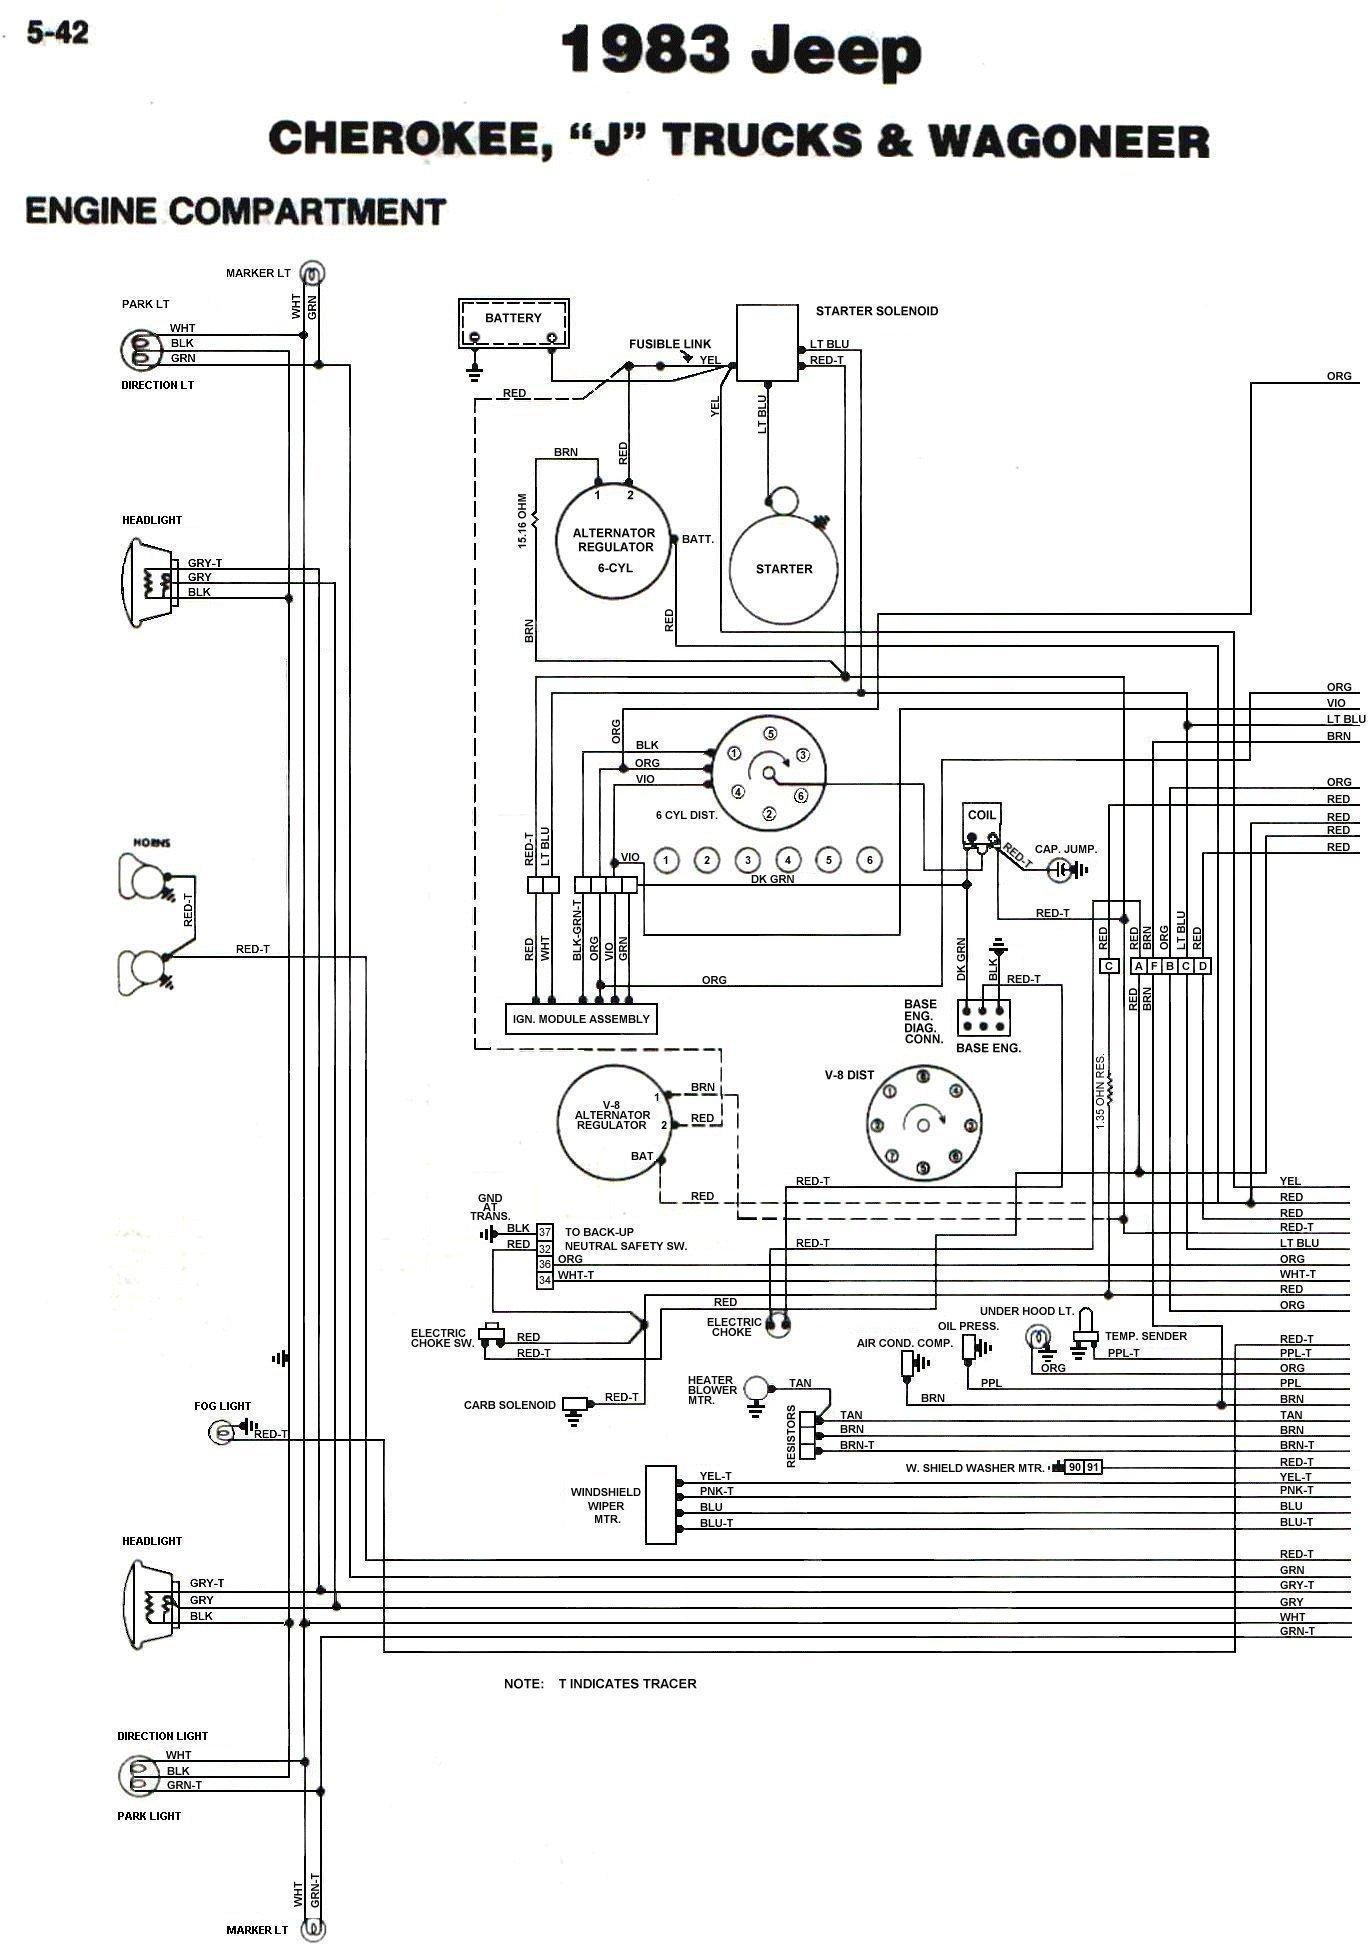 Jeepster Commando Wiring Diagram on 1969 cj5 wiring diagram, 1969 dj5 wiring diagram, 1969 jeep wiring diagram,